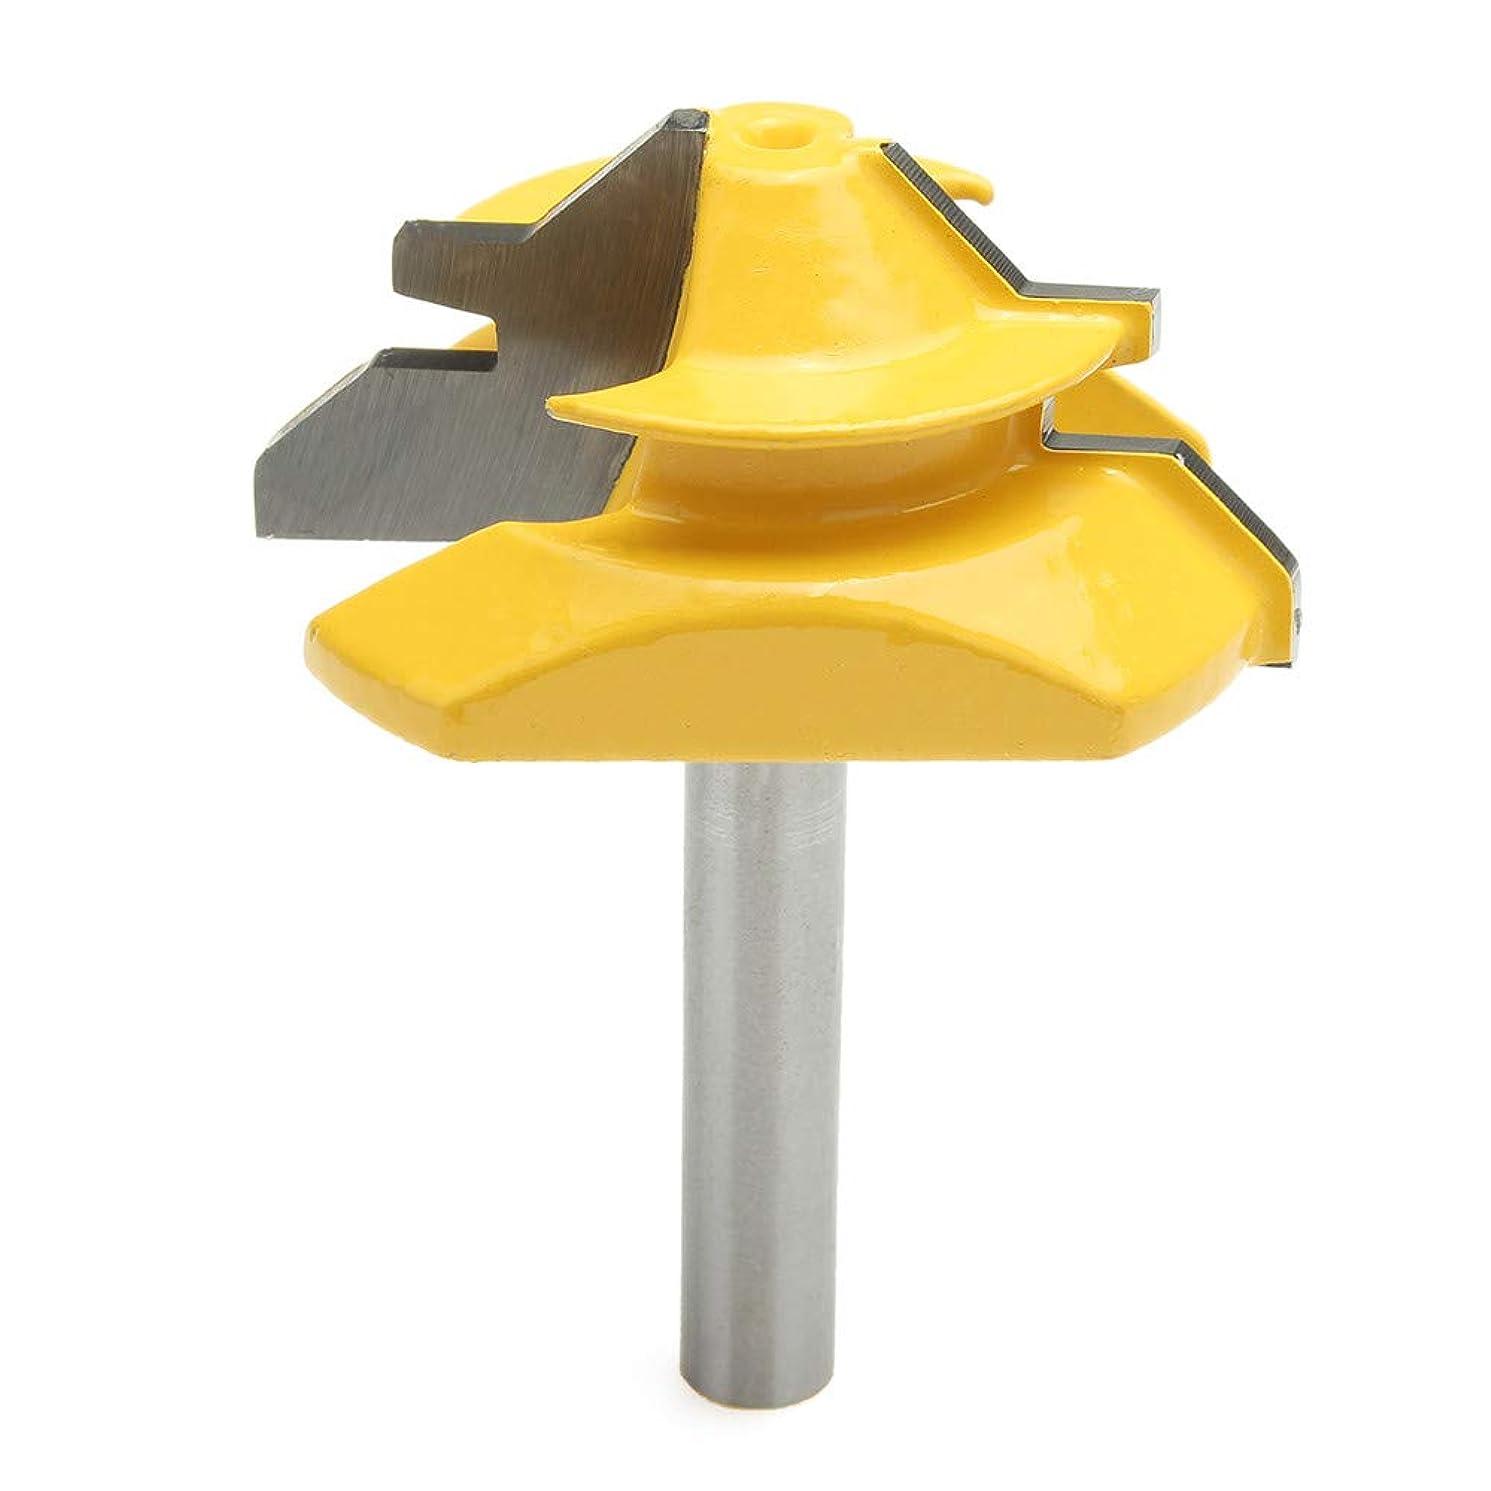 WCHAOEN 45 Degree Lock Miter Glue Joint Router Bit Woodworking Cutter 8mm Shank Diameter Accessories Tool